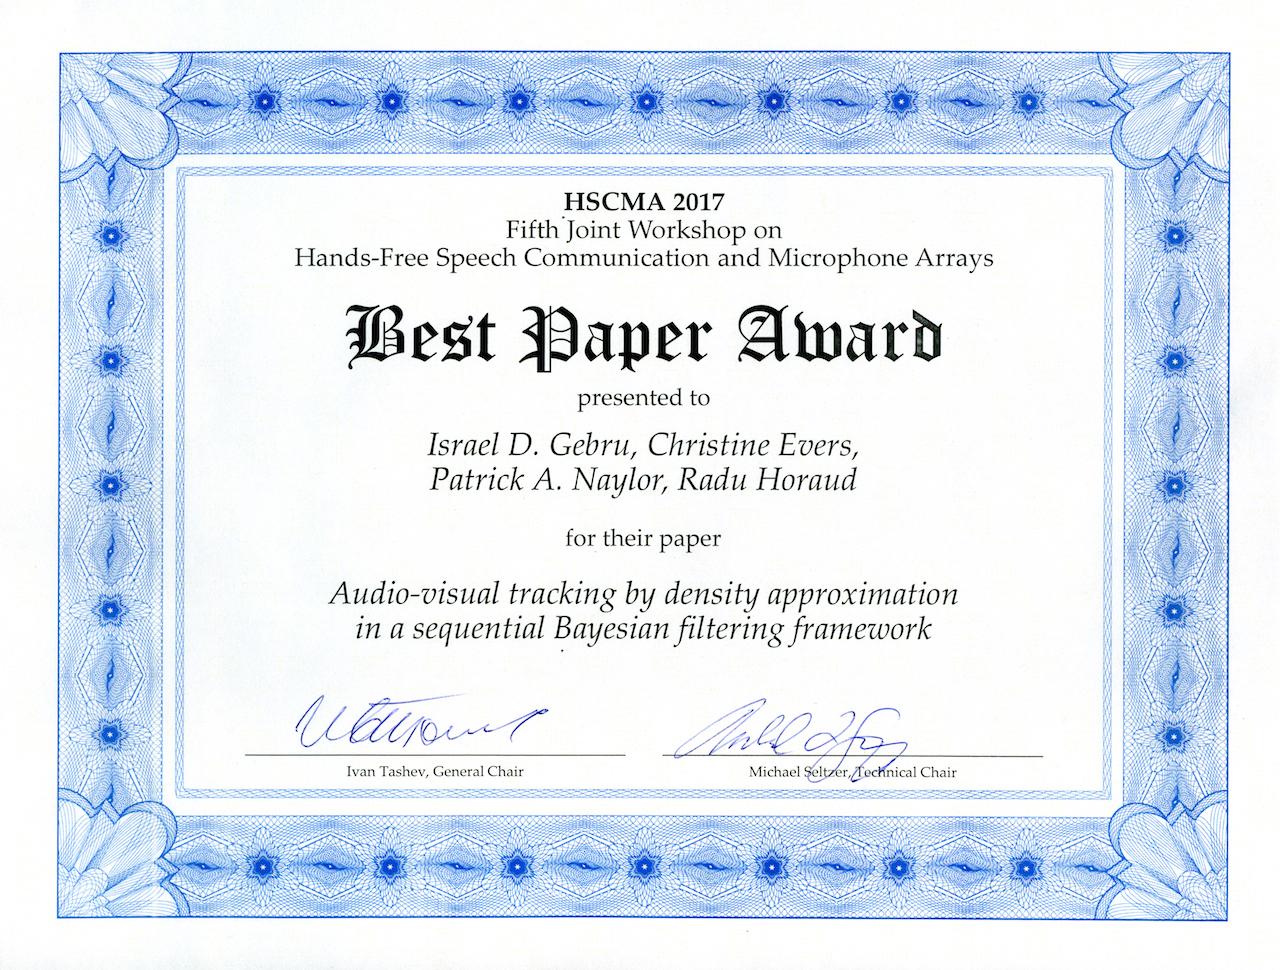 Best Paper Award HSCMA 2017